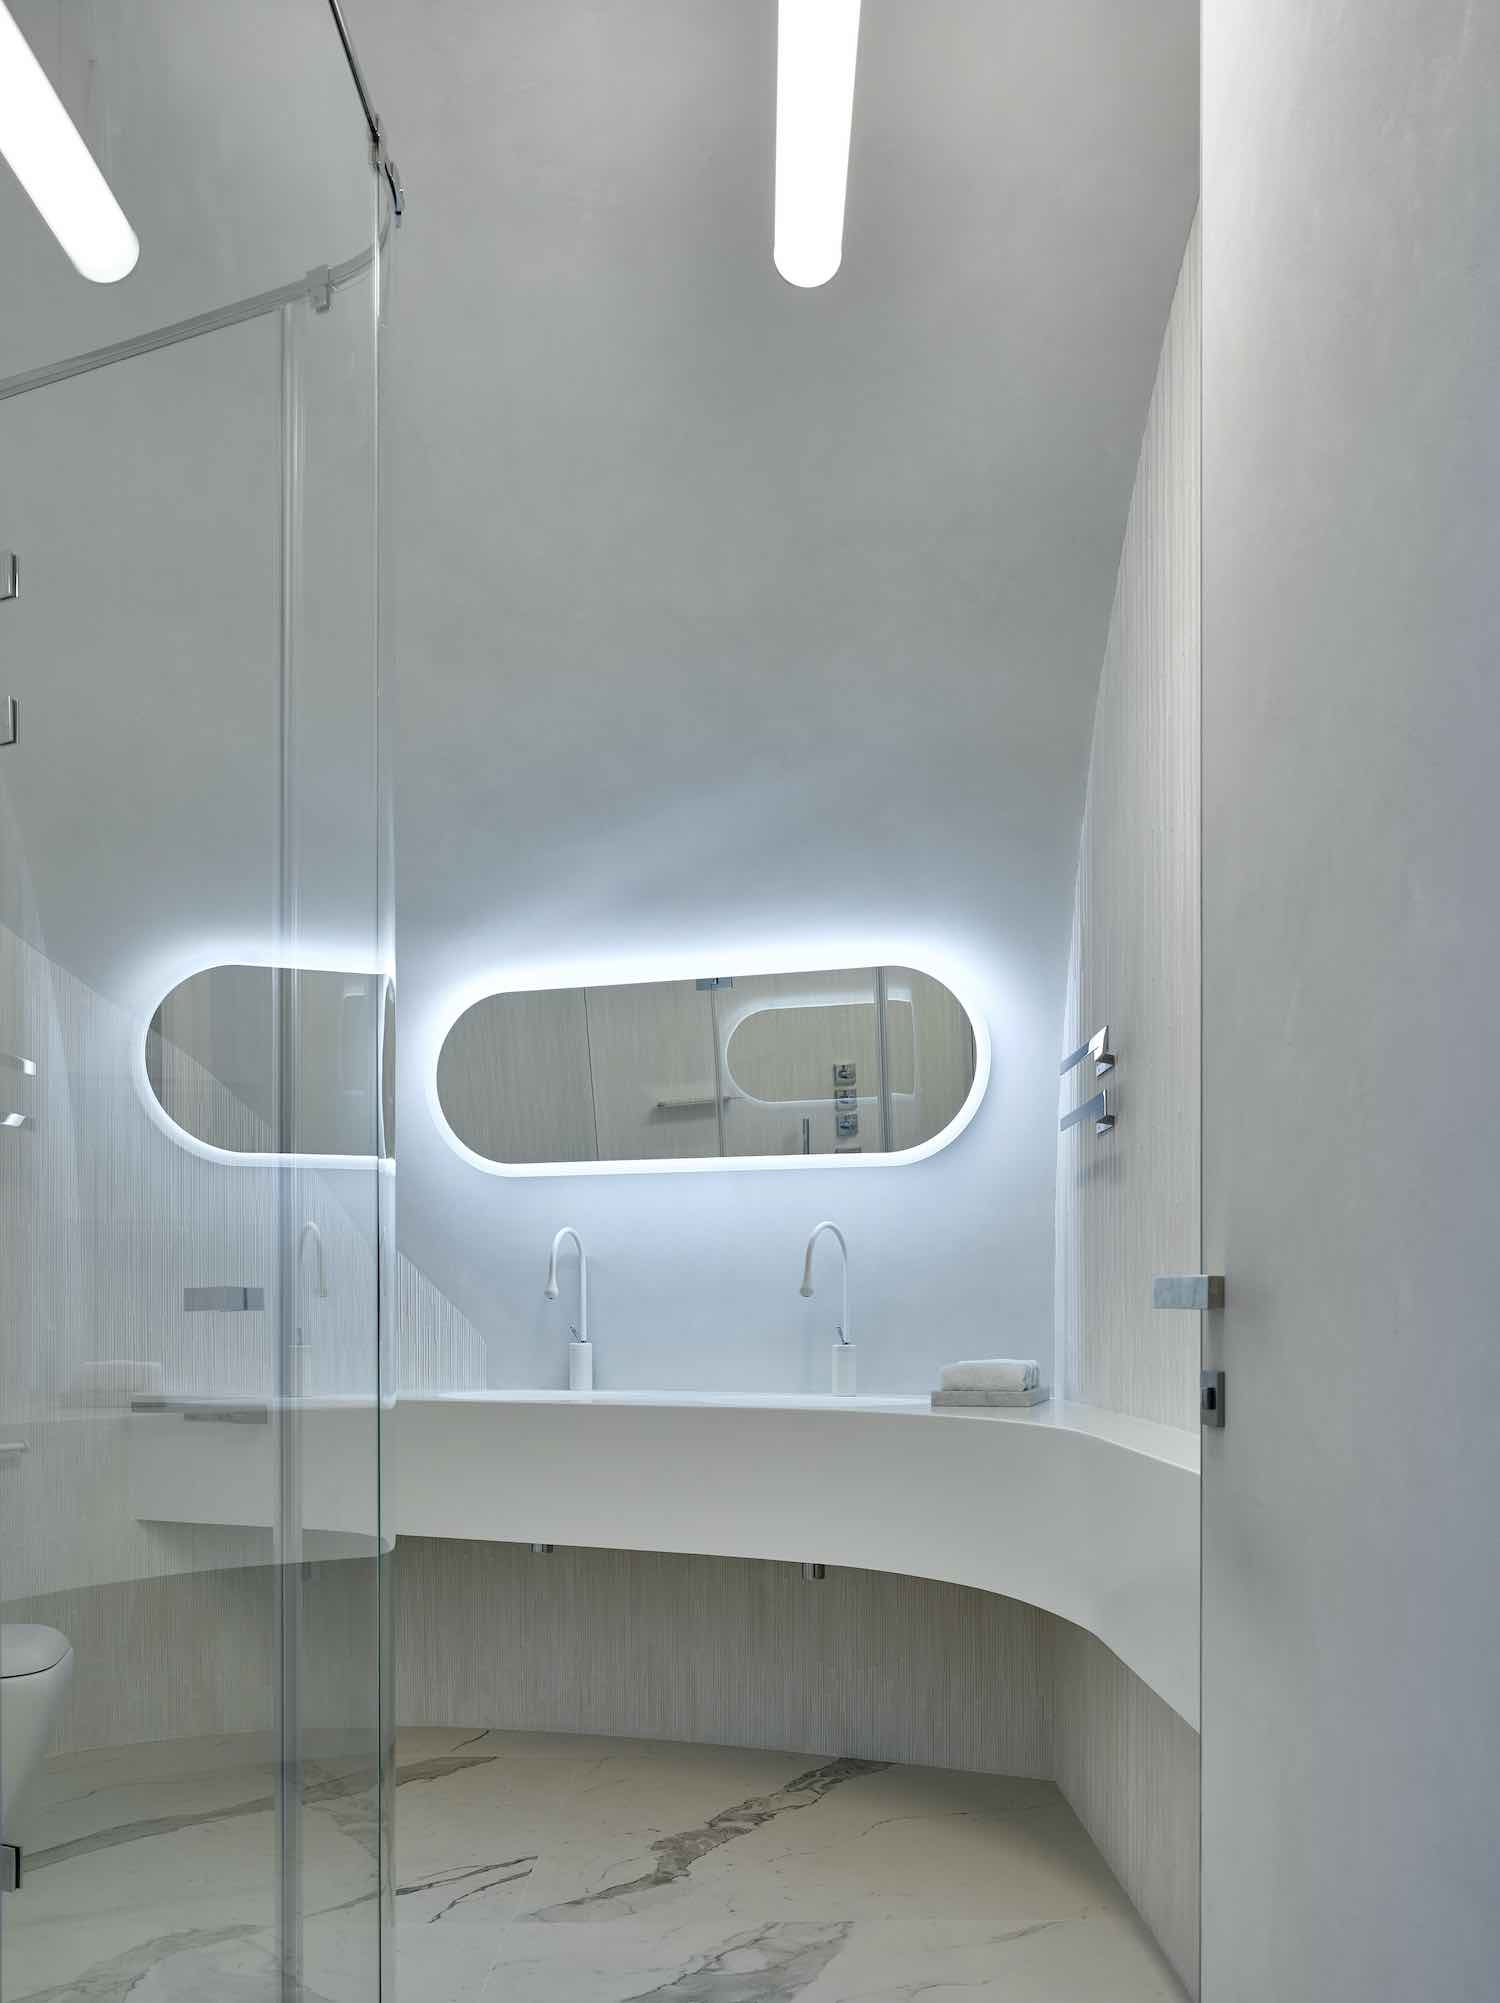 an elliptical mirror with illumination